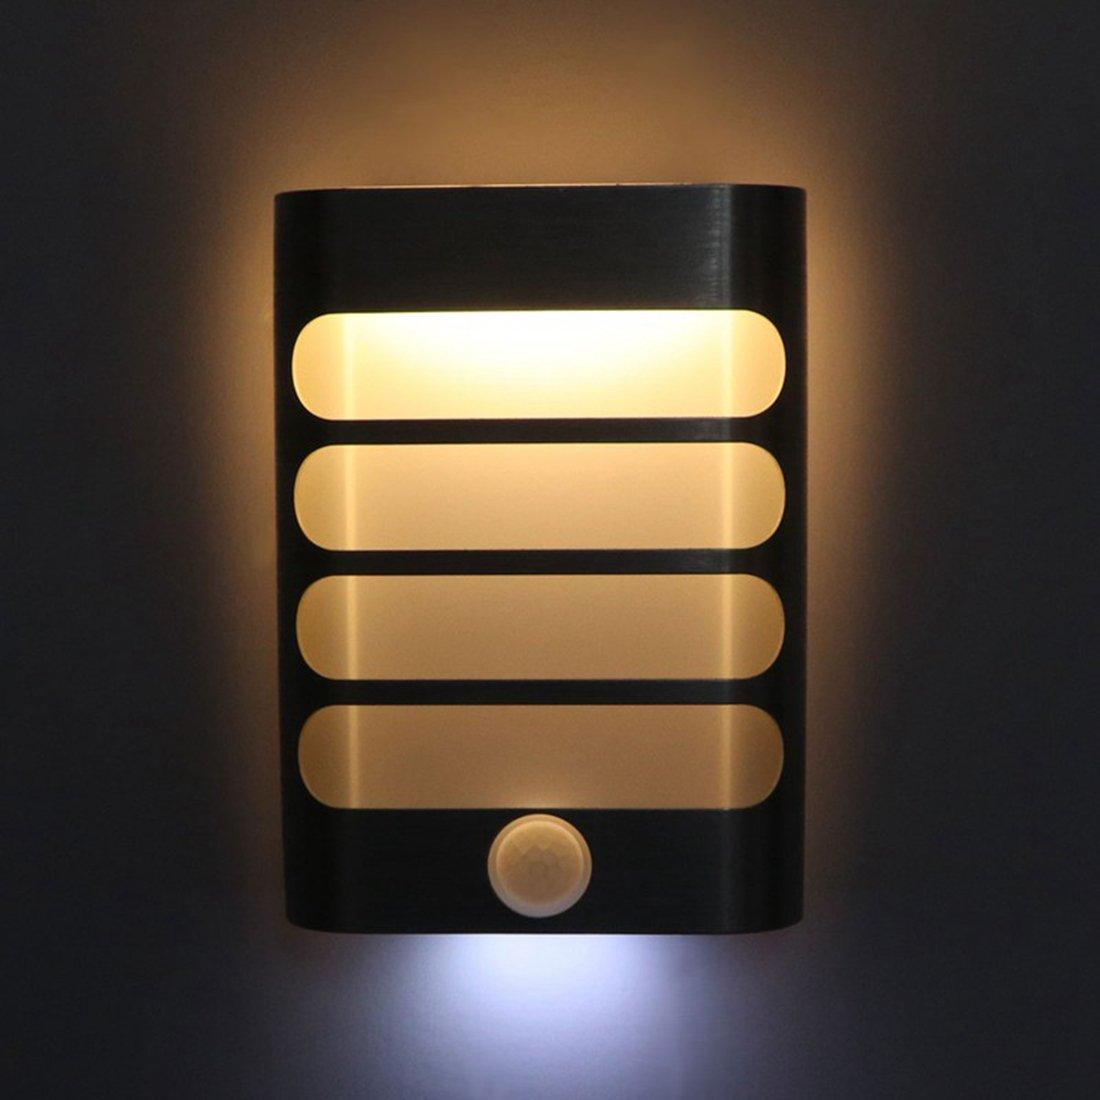 Motion Sensor Light, Alotm Cordless Battery-Powered LED Night Light, Stick-anywhere Closet Lights Stair Lights, Security Lights for Hotel, Child's Room, Kitchen, Hallway, Bedroom etc. (Warm)